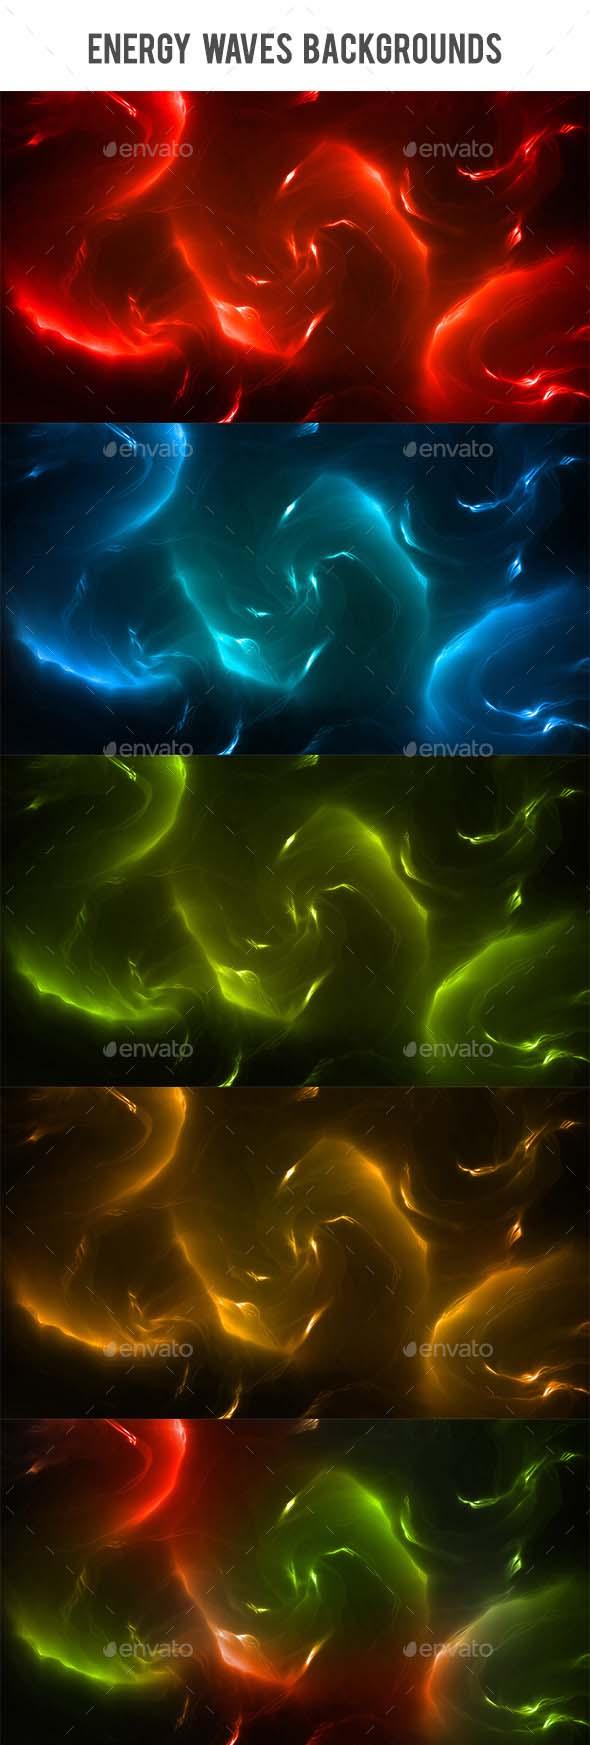 Energy Waves Backgrounds